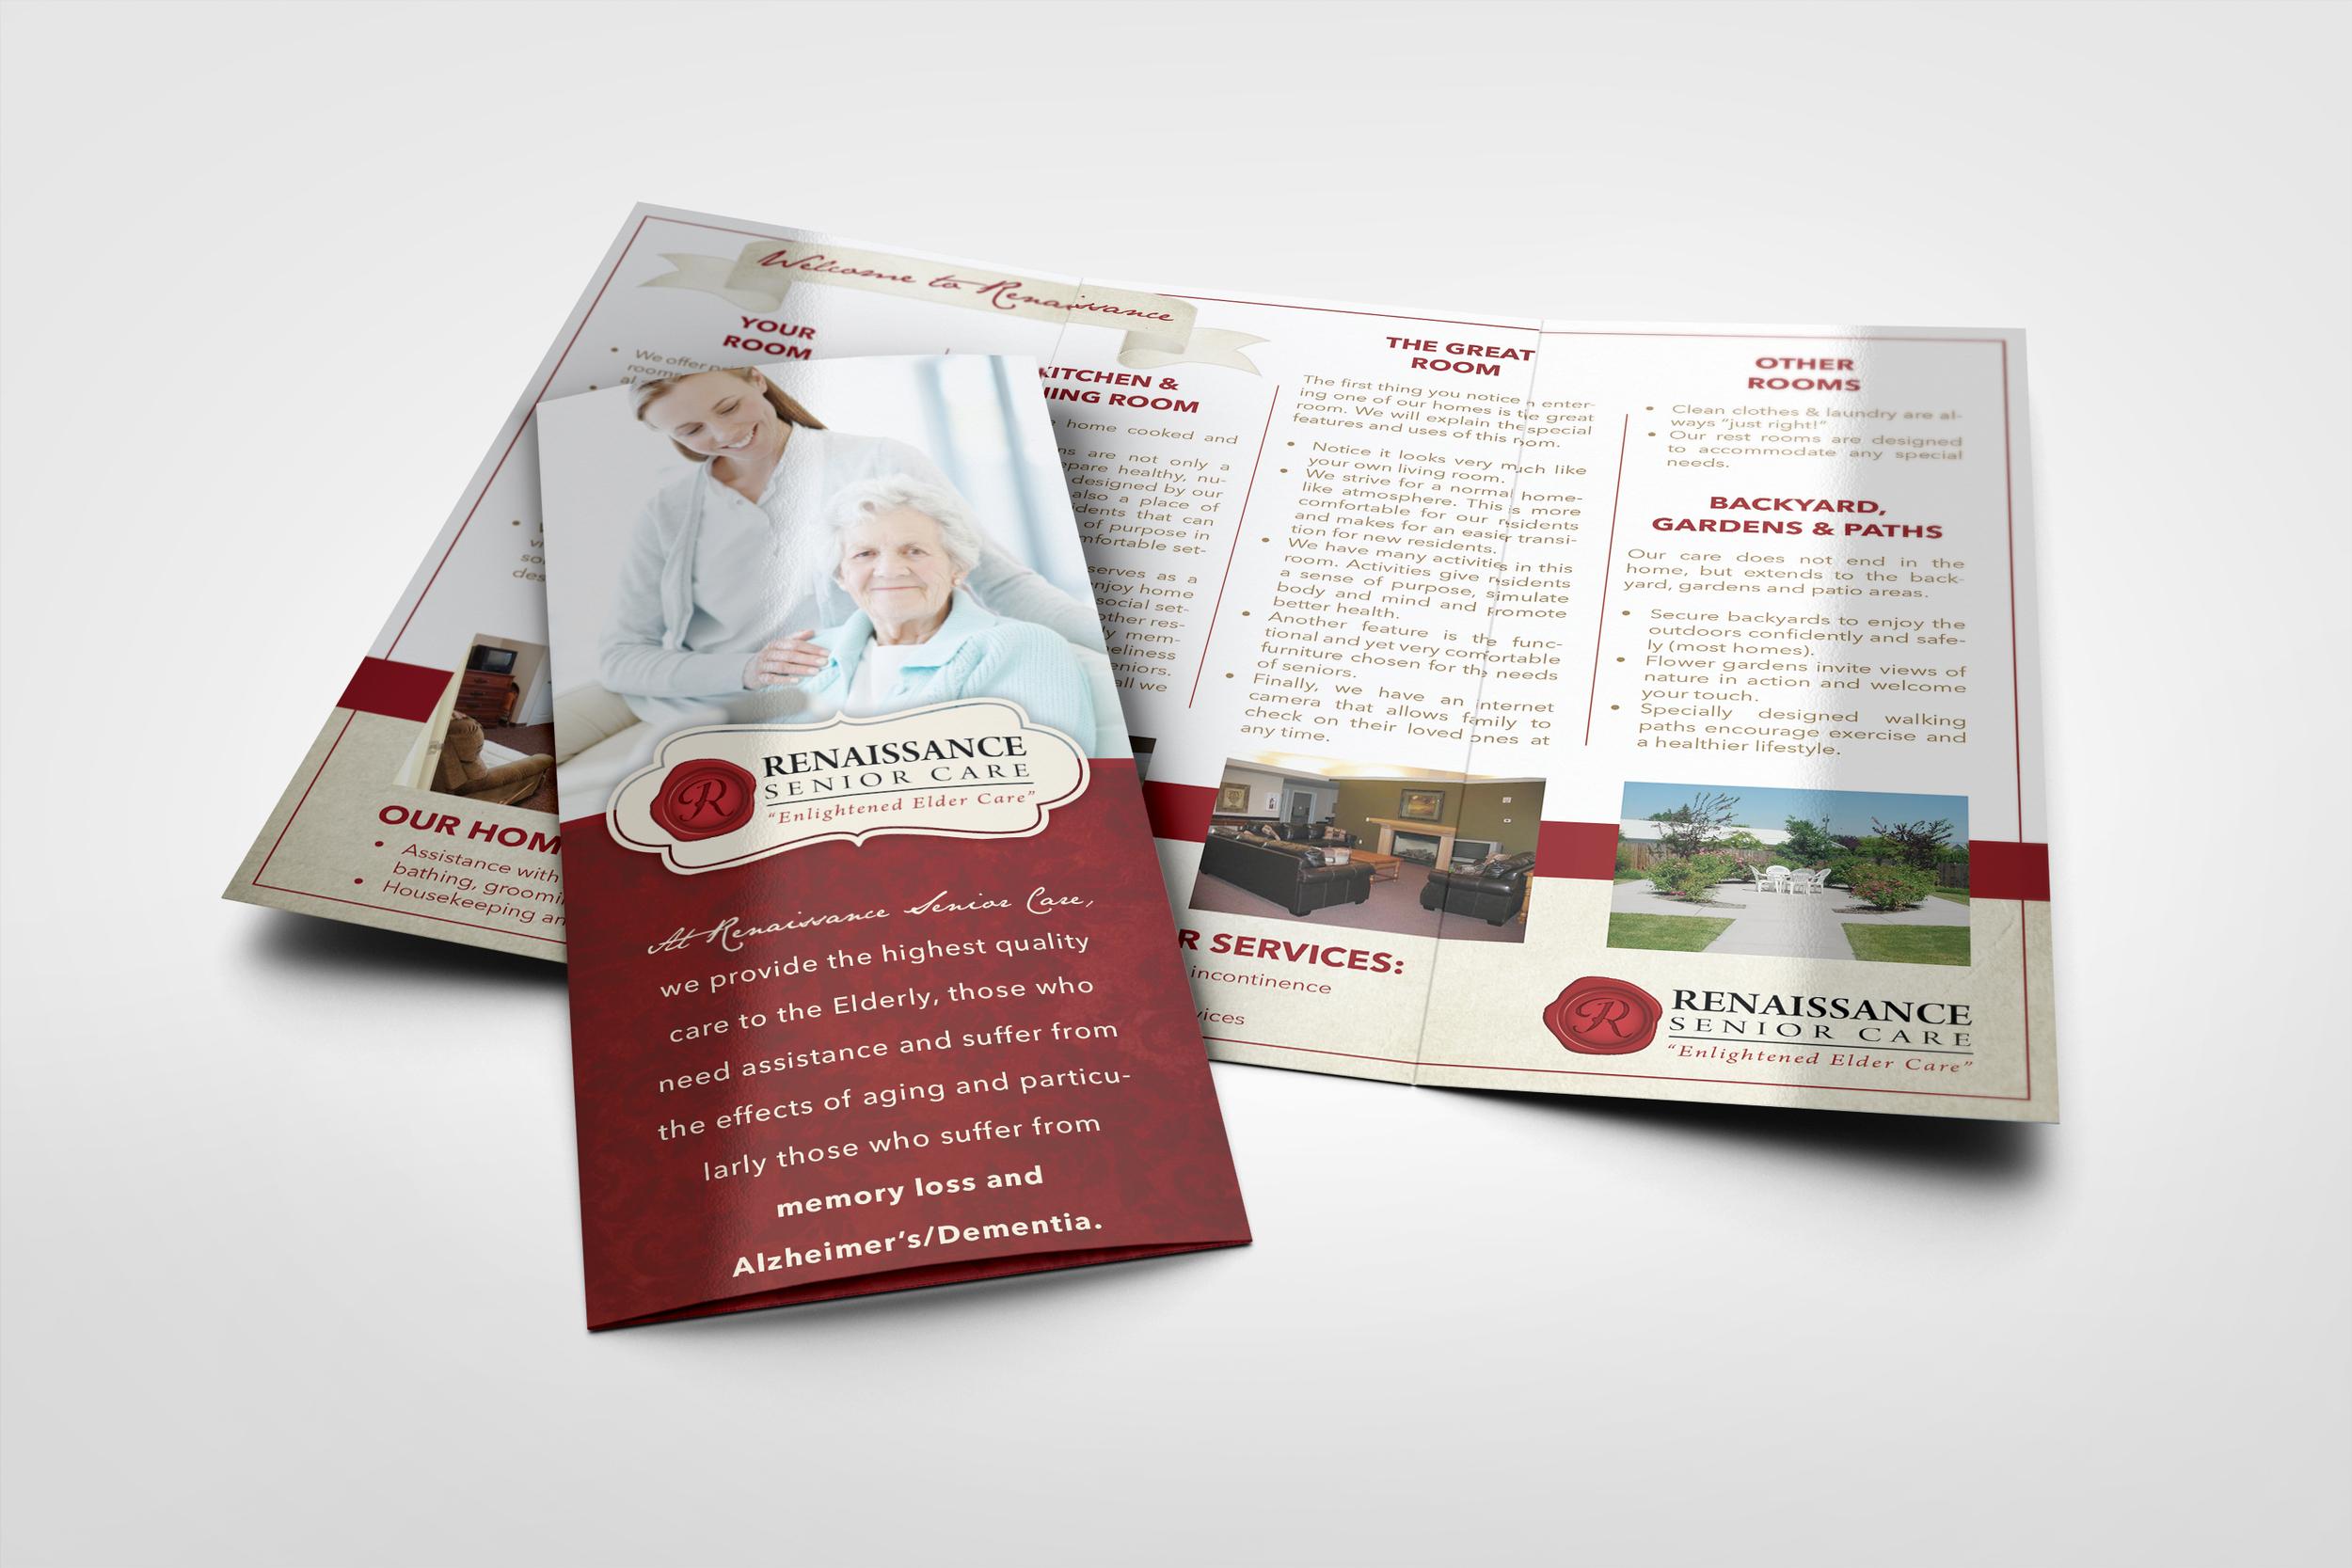 Renaissance Brochure.jpg